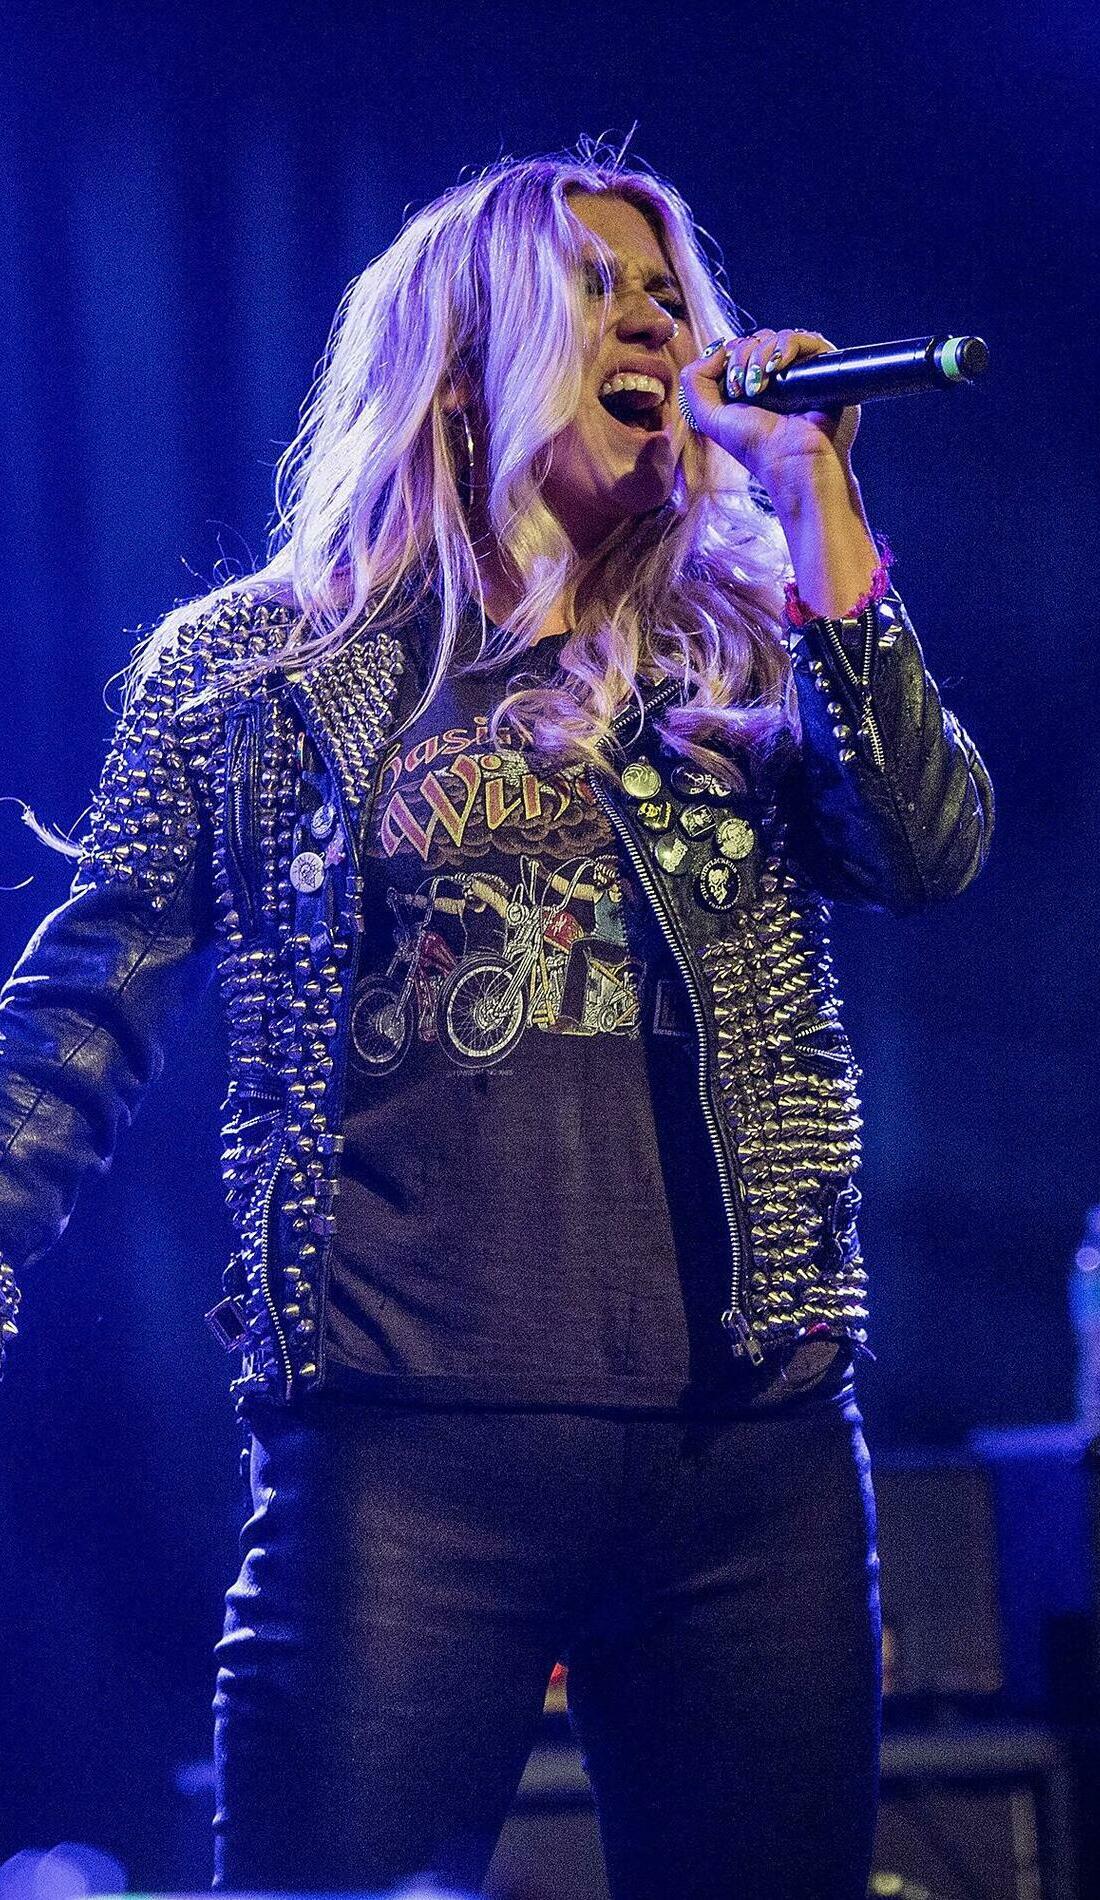 A Kesha live event